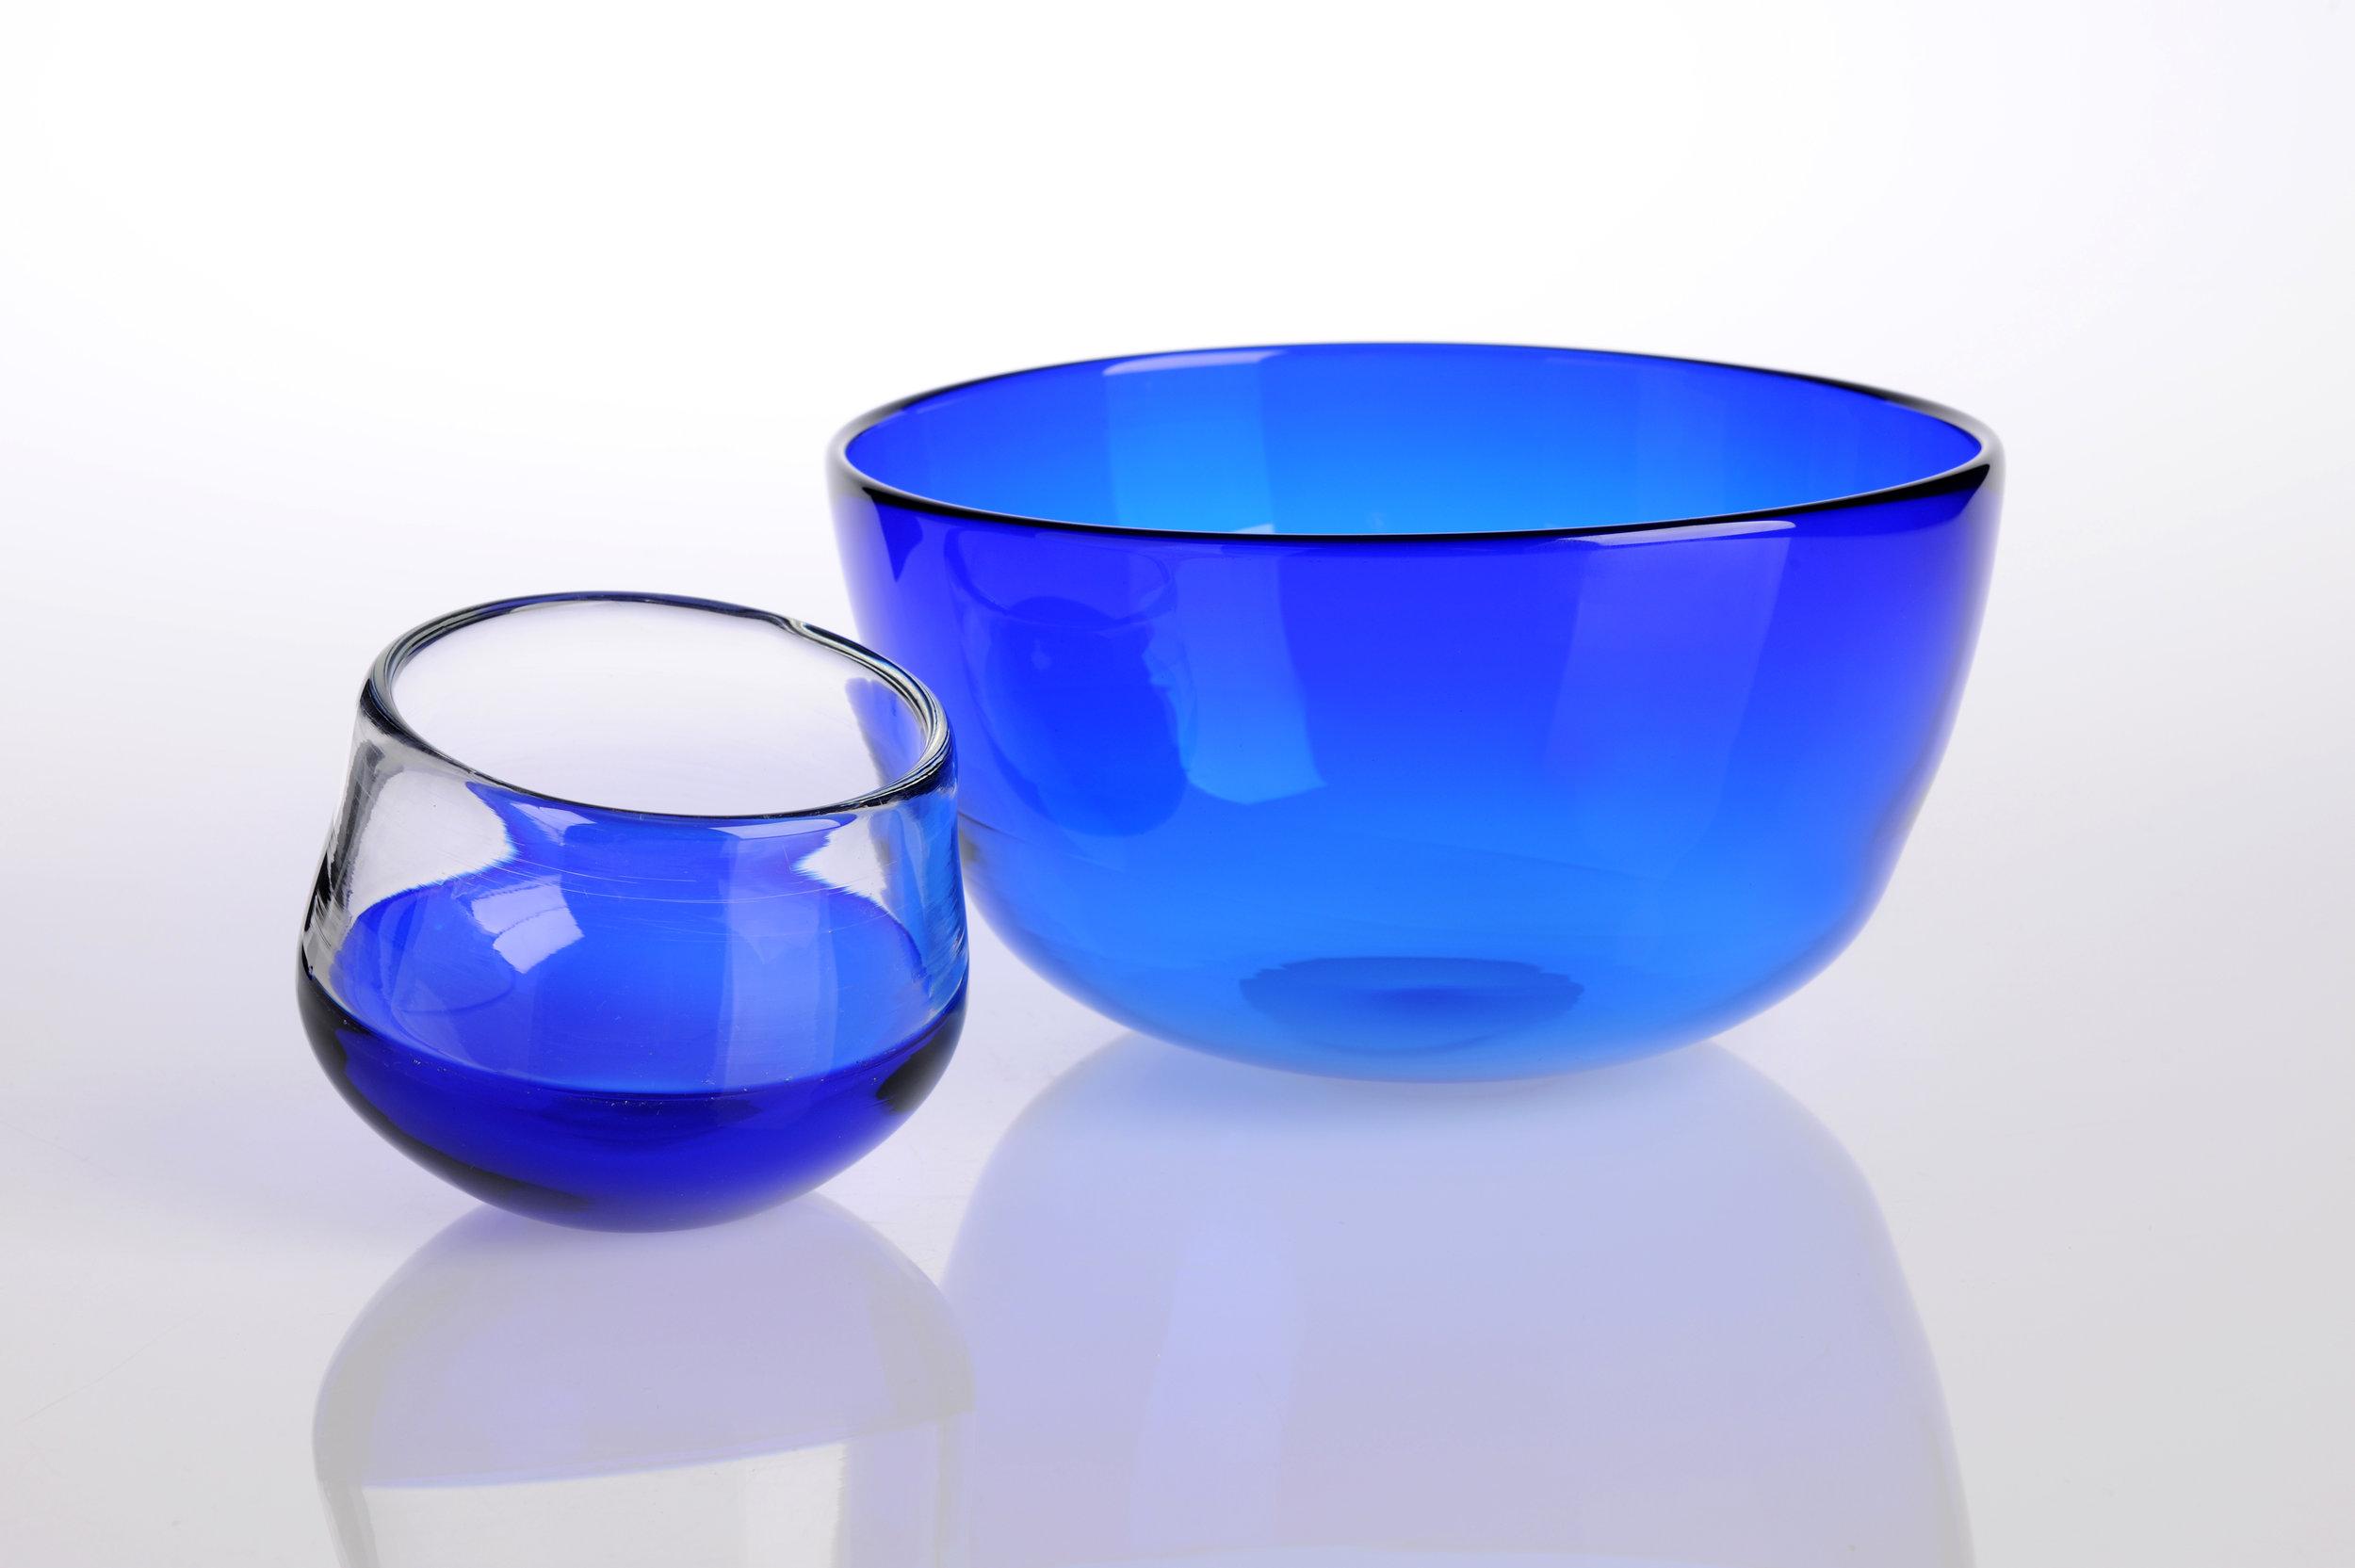 Blue Bowls, 2013 Photo Credit Michael Haines